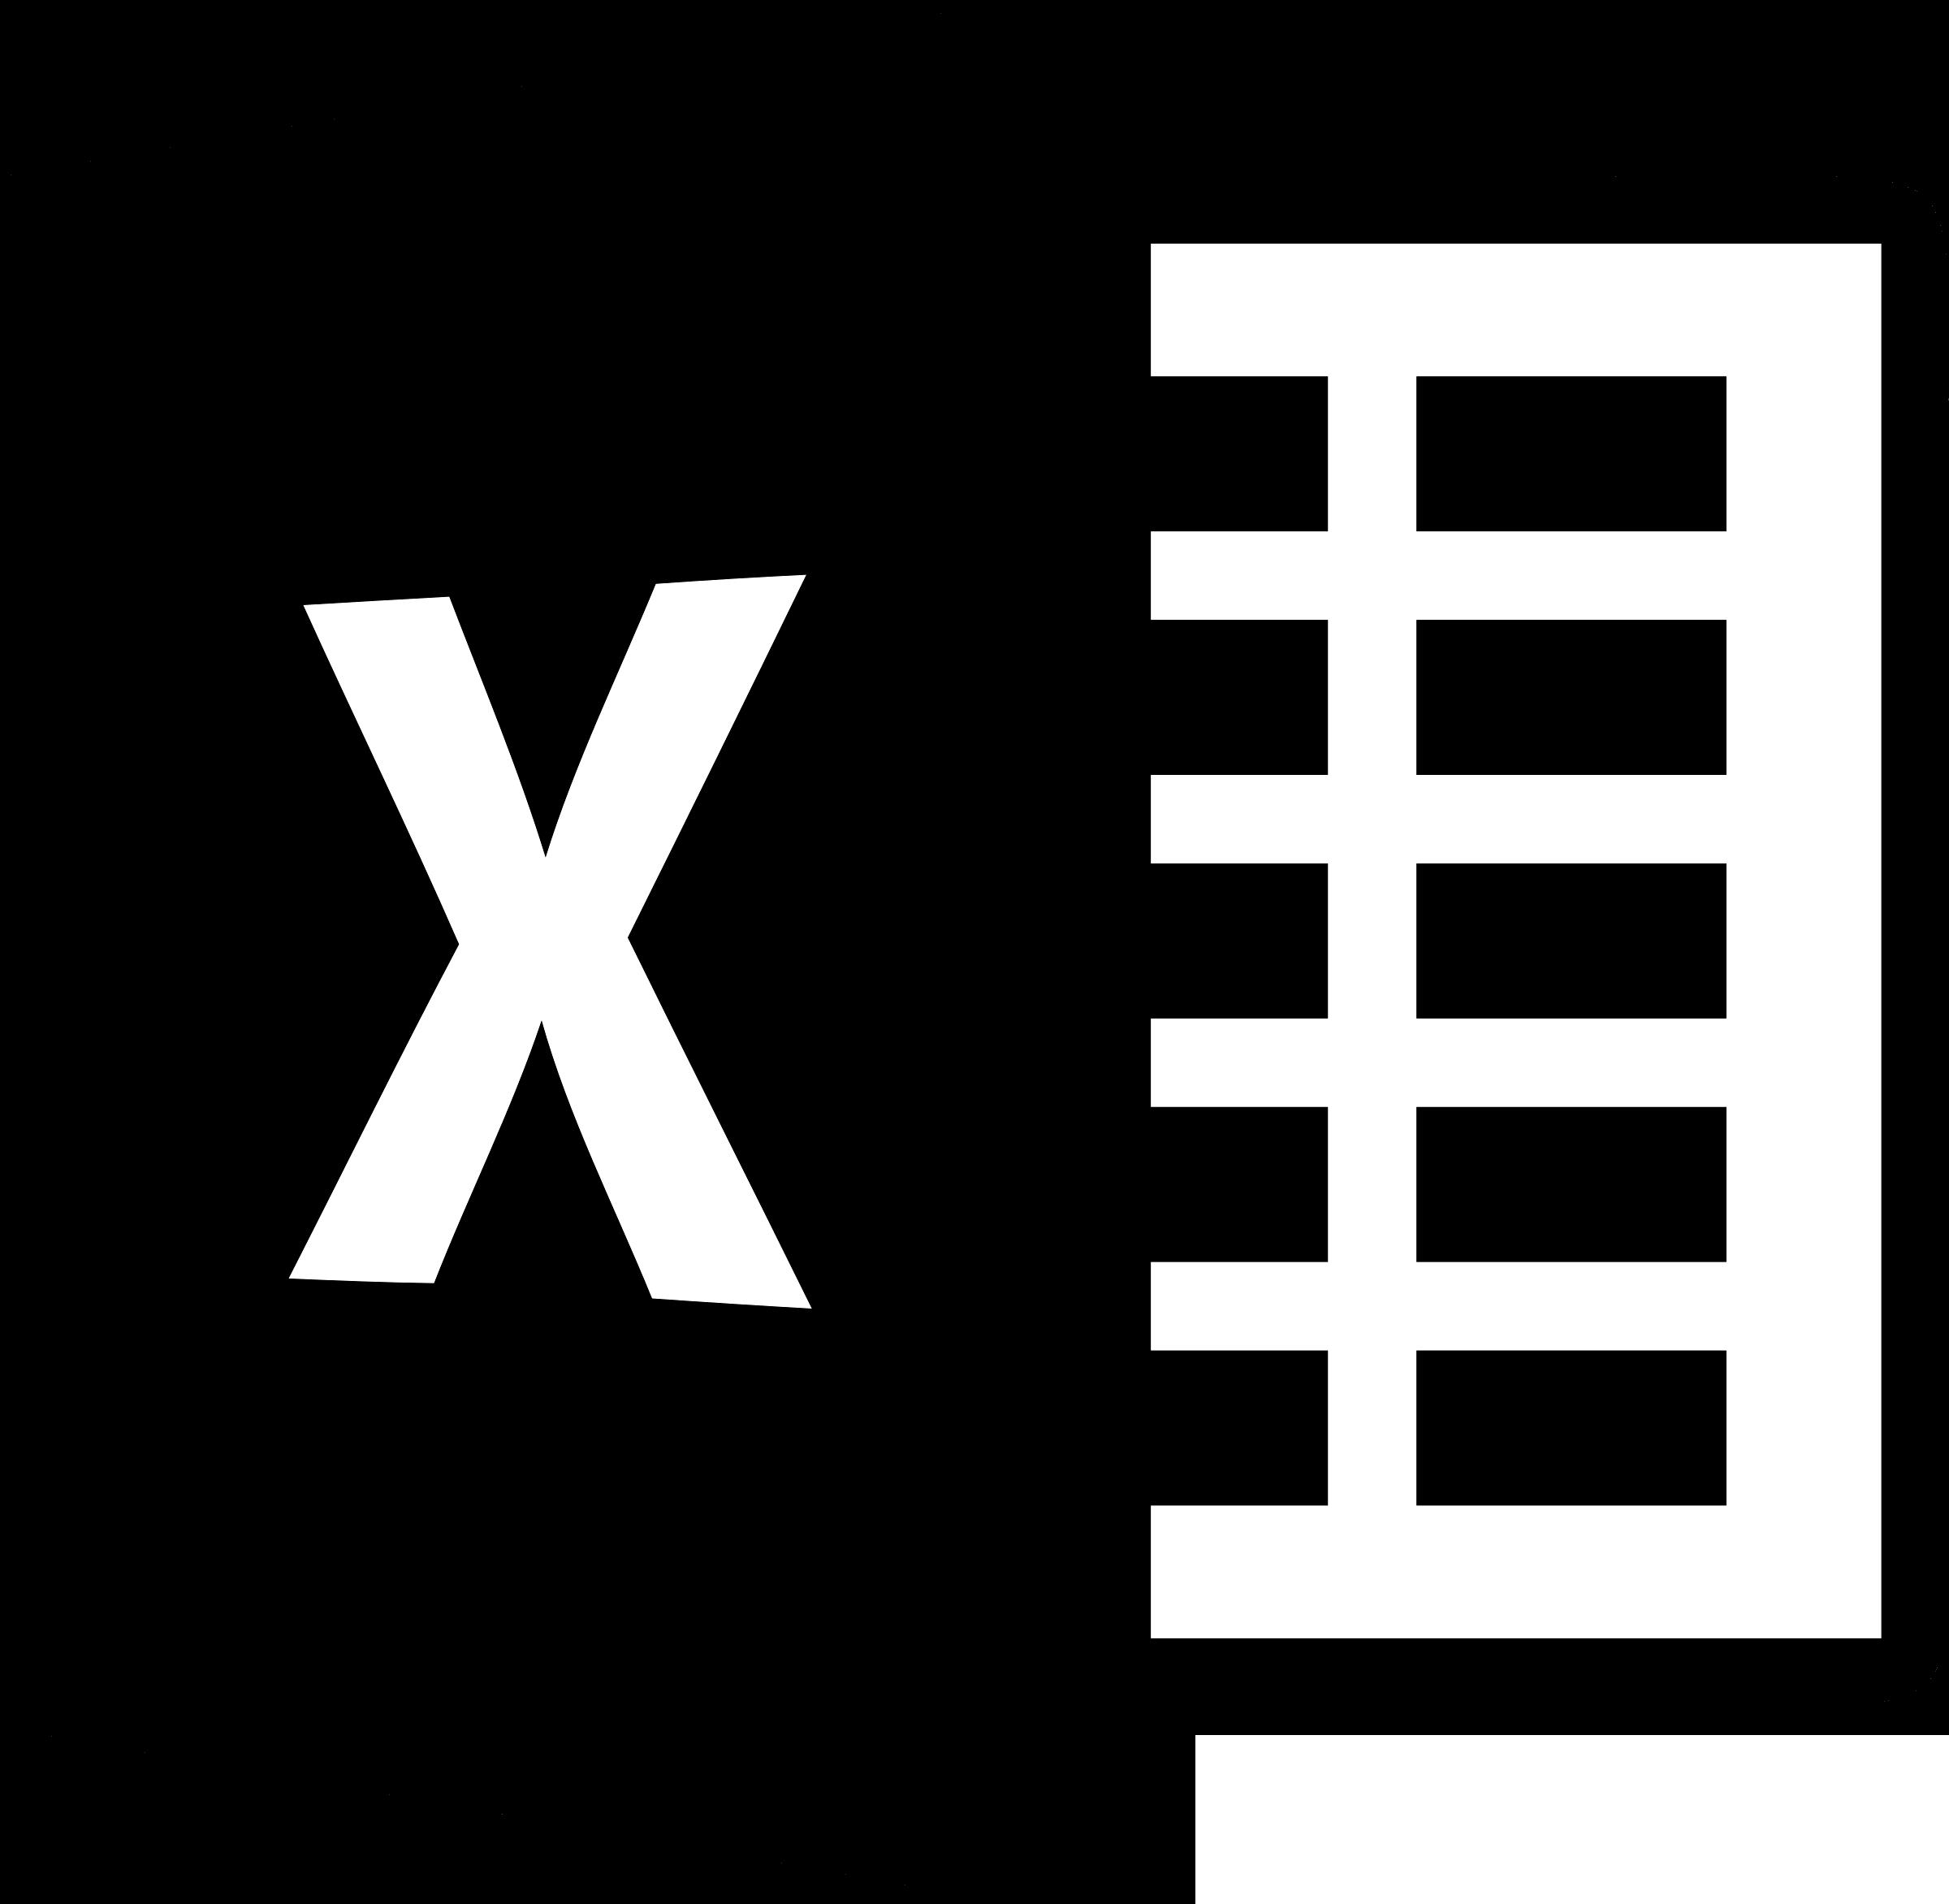 microsoft excel 2013 logo black and white